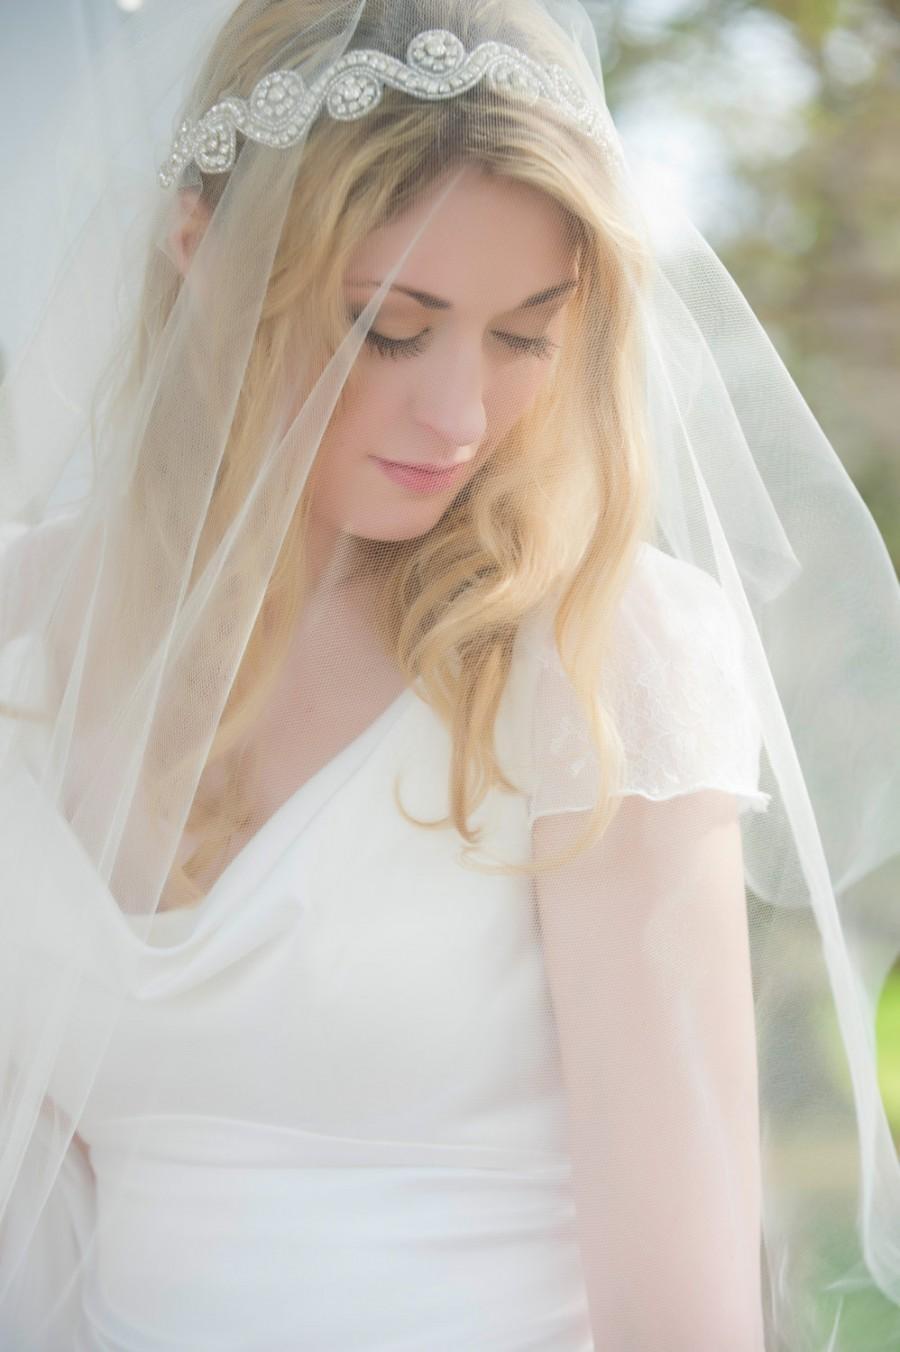 Hochzeit - Crystal Edge Cap Veil, Juliet Cap Veil, Vintage Inspired Tulle Veil, Juliette Veil, Rhinestones, Crystals, Art Deco Veil, 1920's style veil